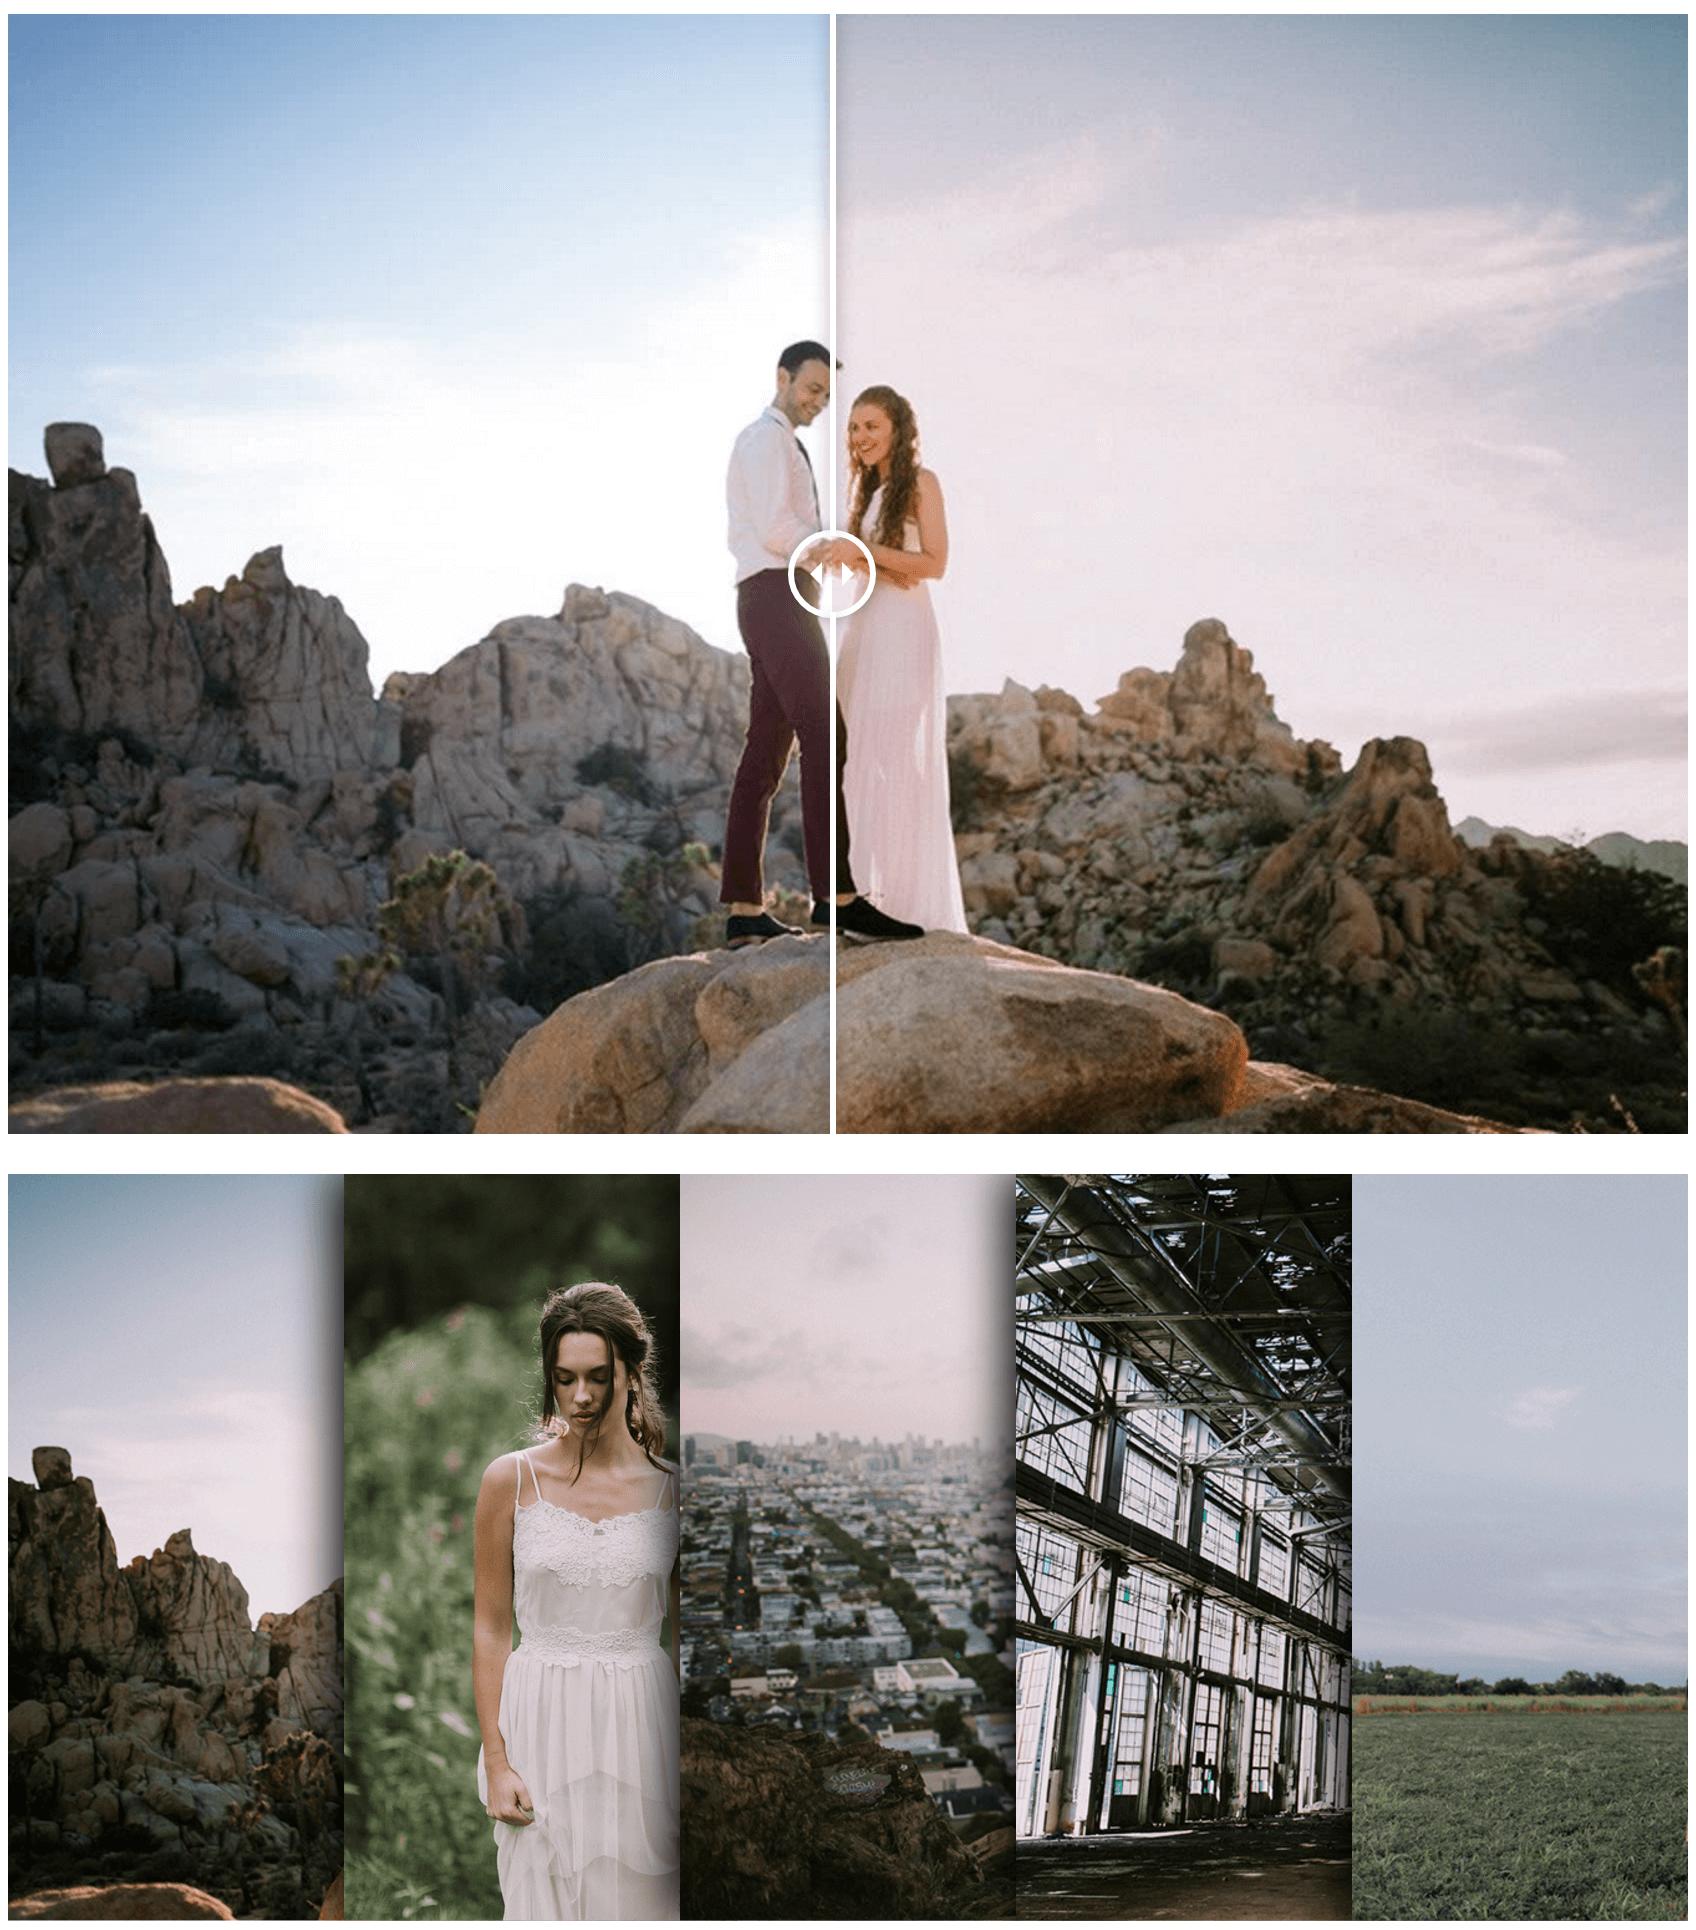 Loren & Chris LR Presets, Best Lightroom presets for photographers - tribe archipelago